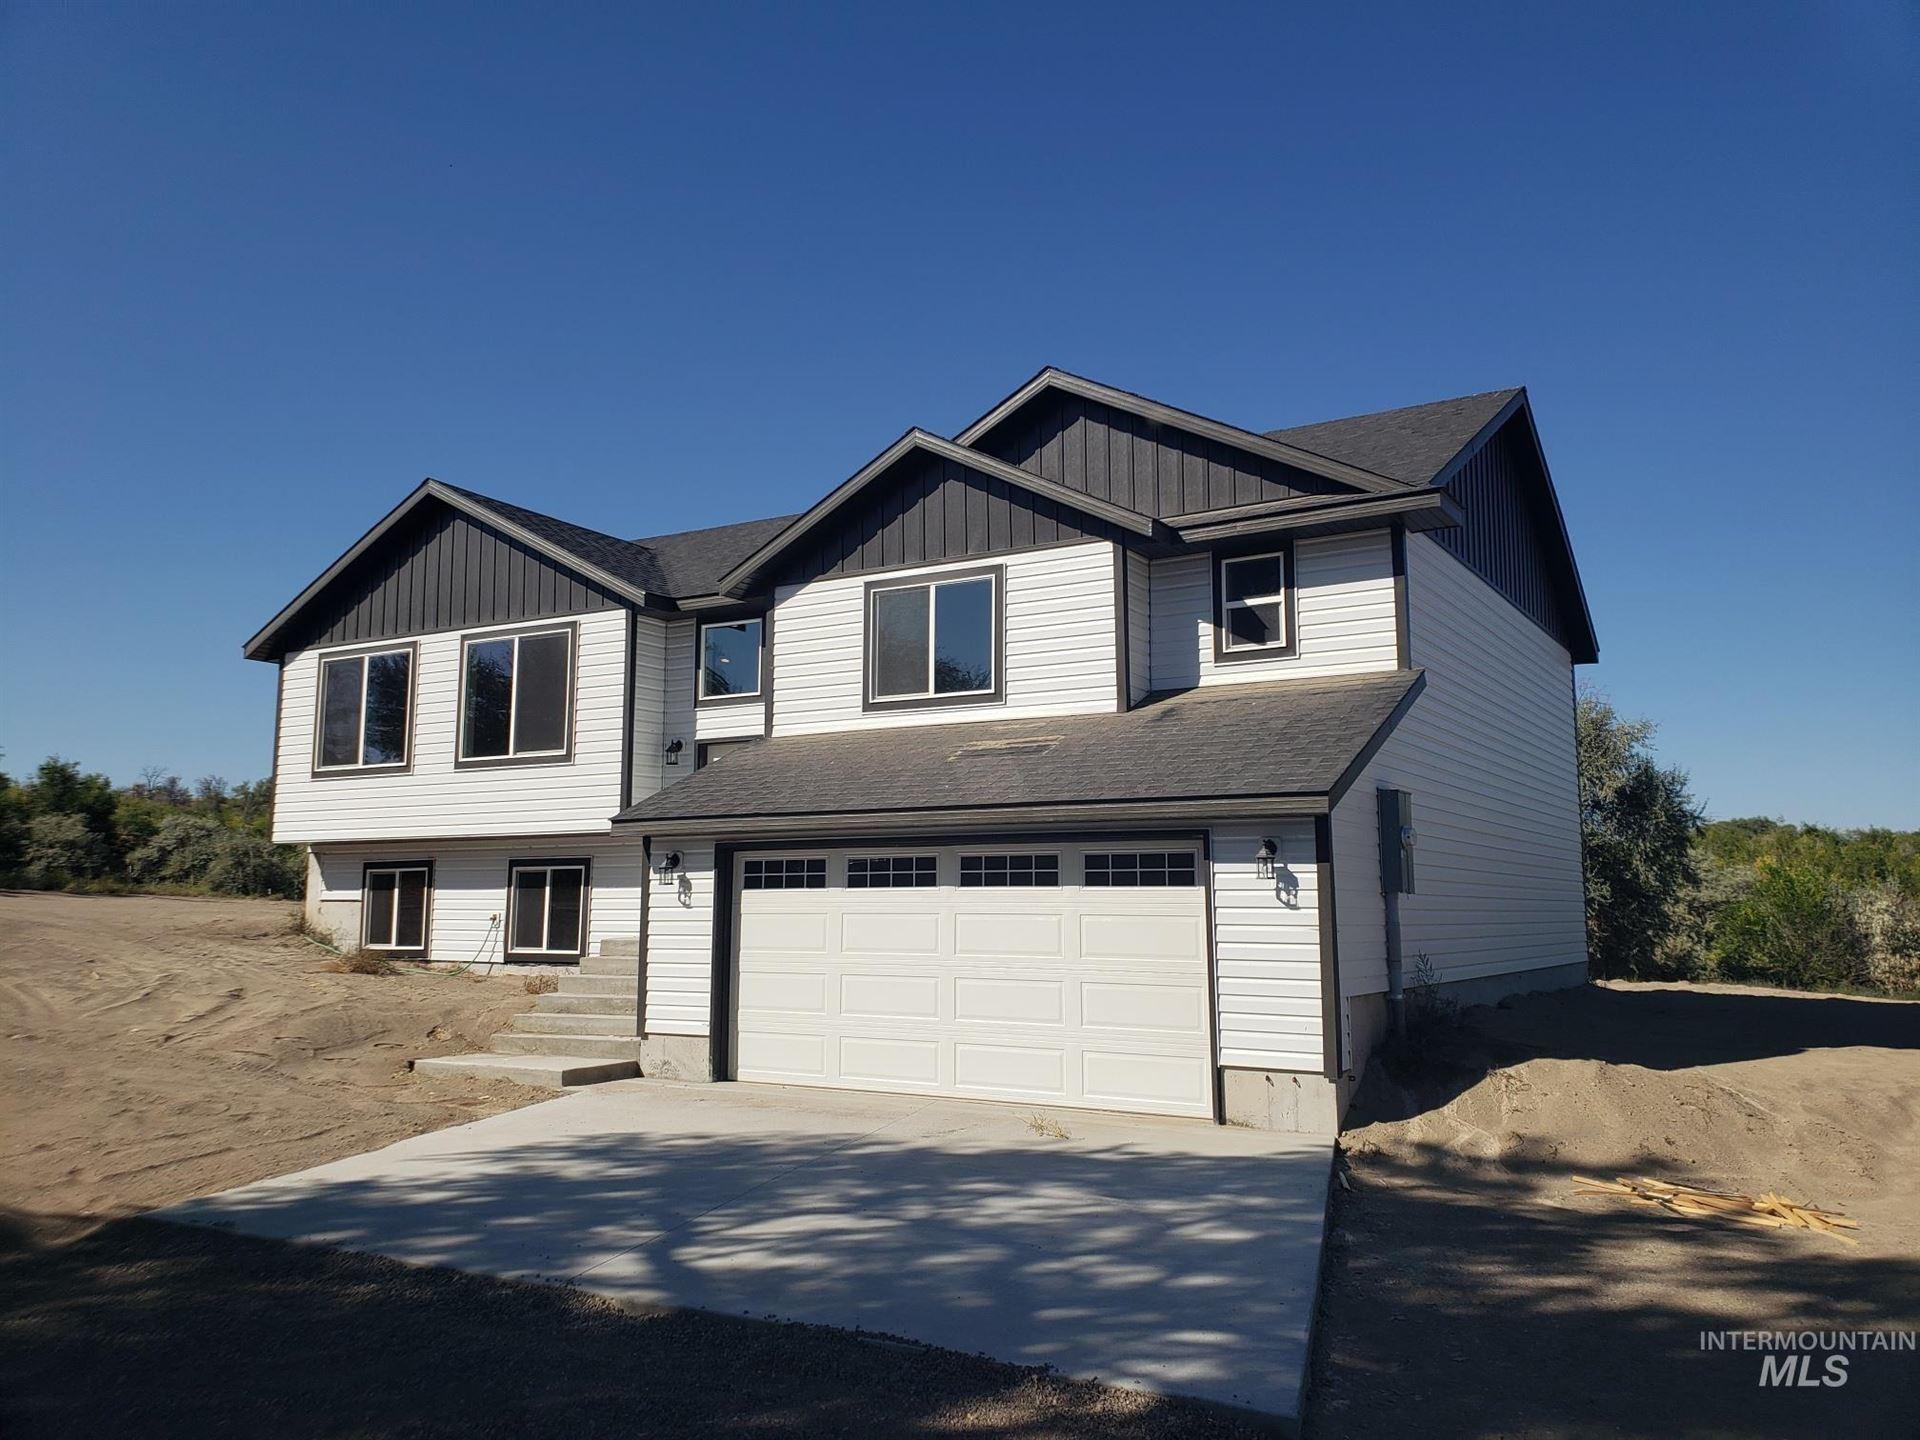 4487 Mud Creek Rd, Buhl, ID 83316 - MLS#: 98808655